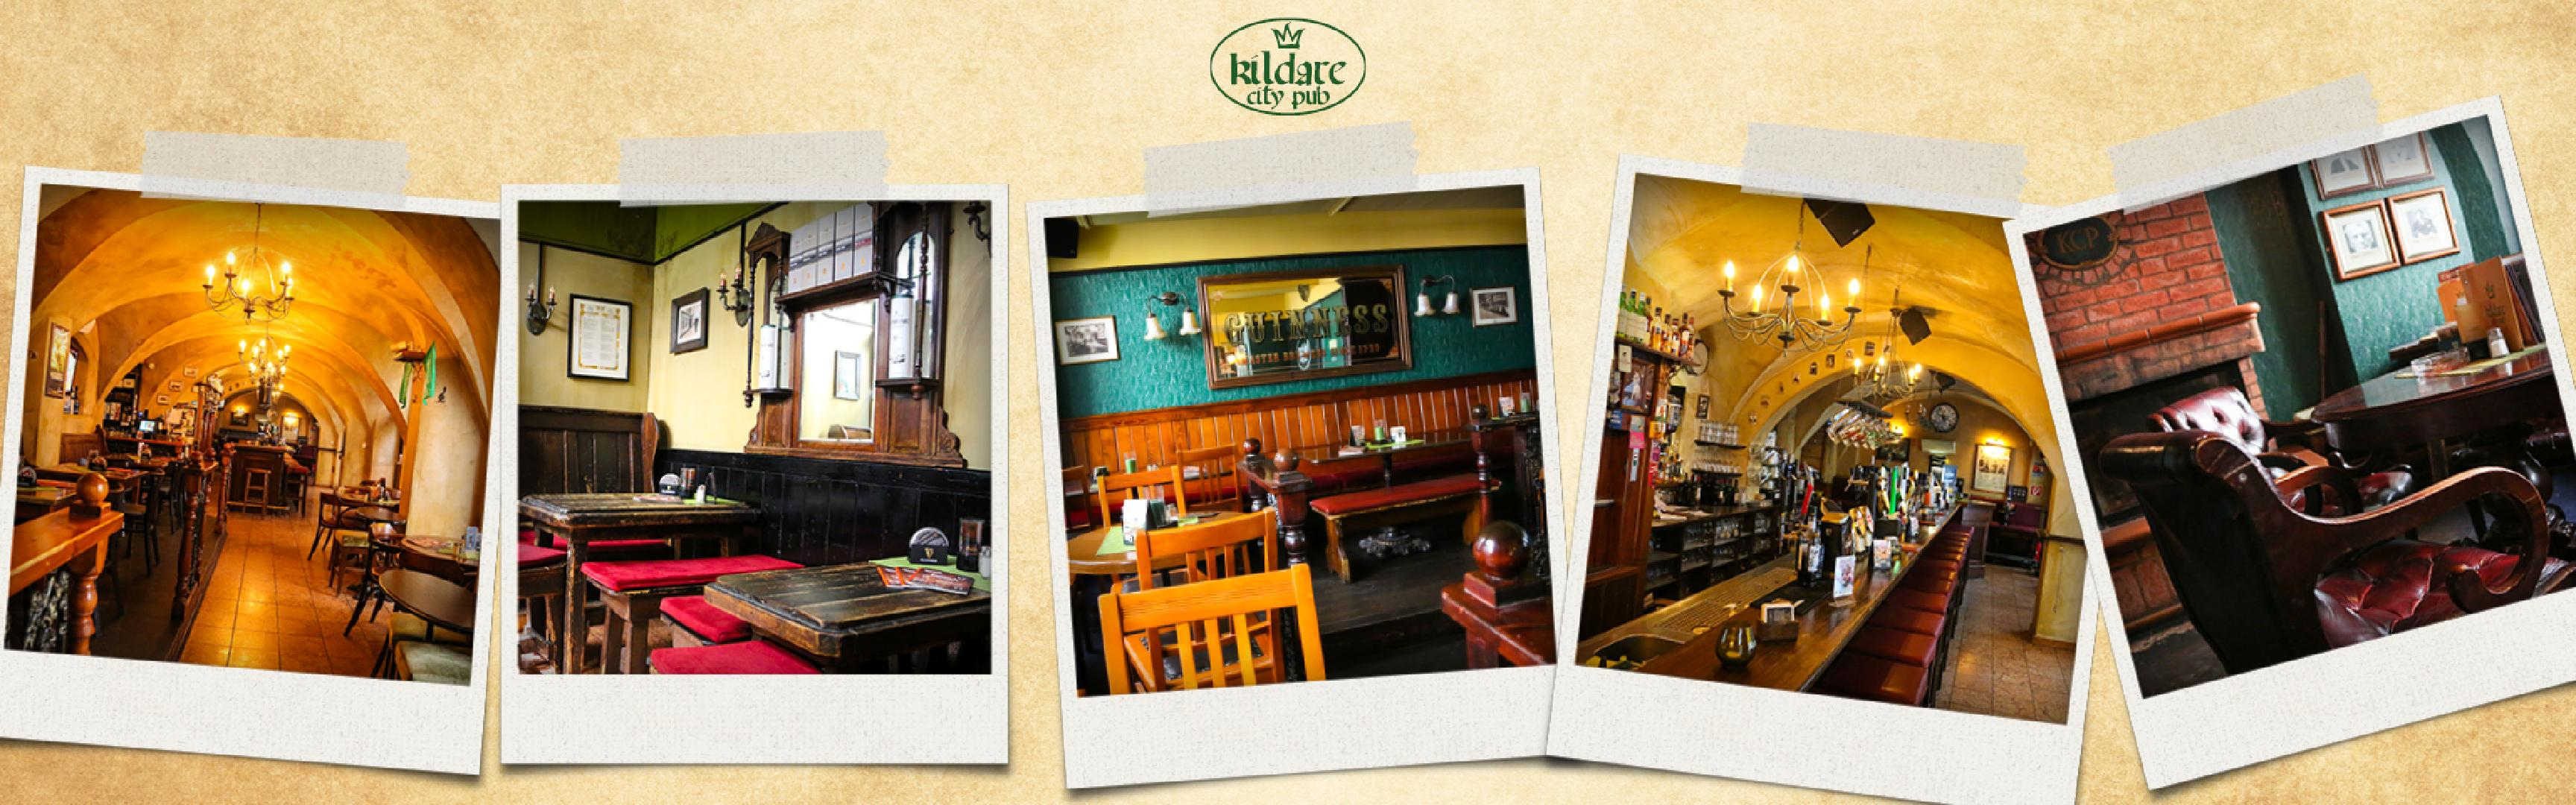 Kildare City Pub Leipzig